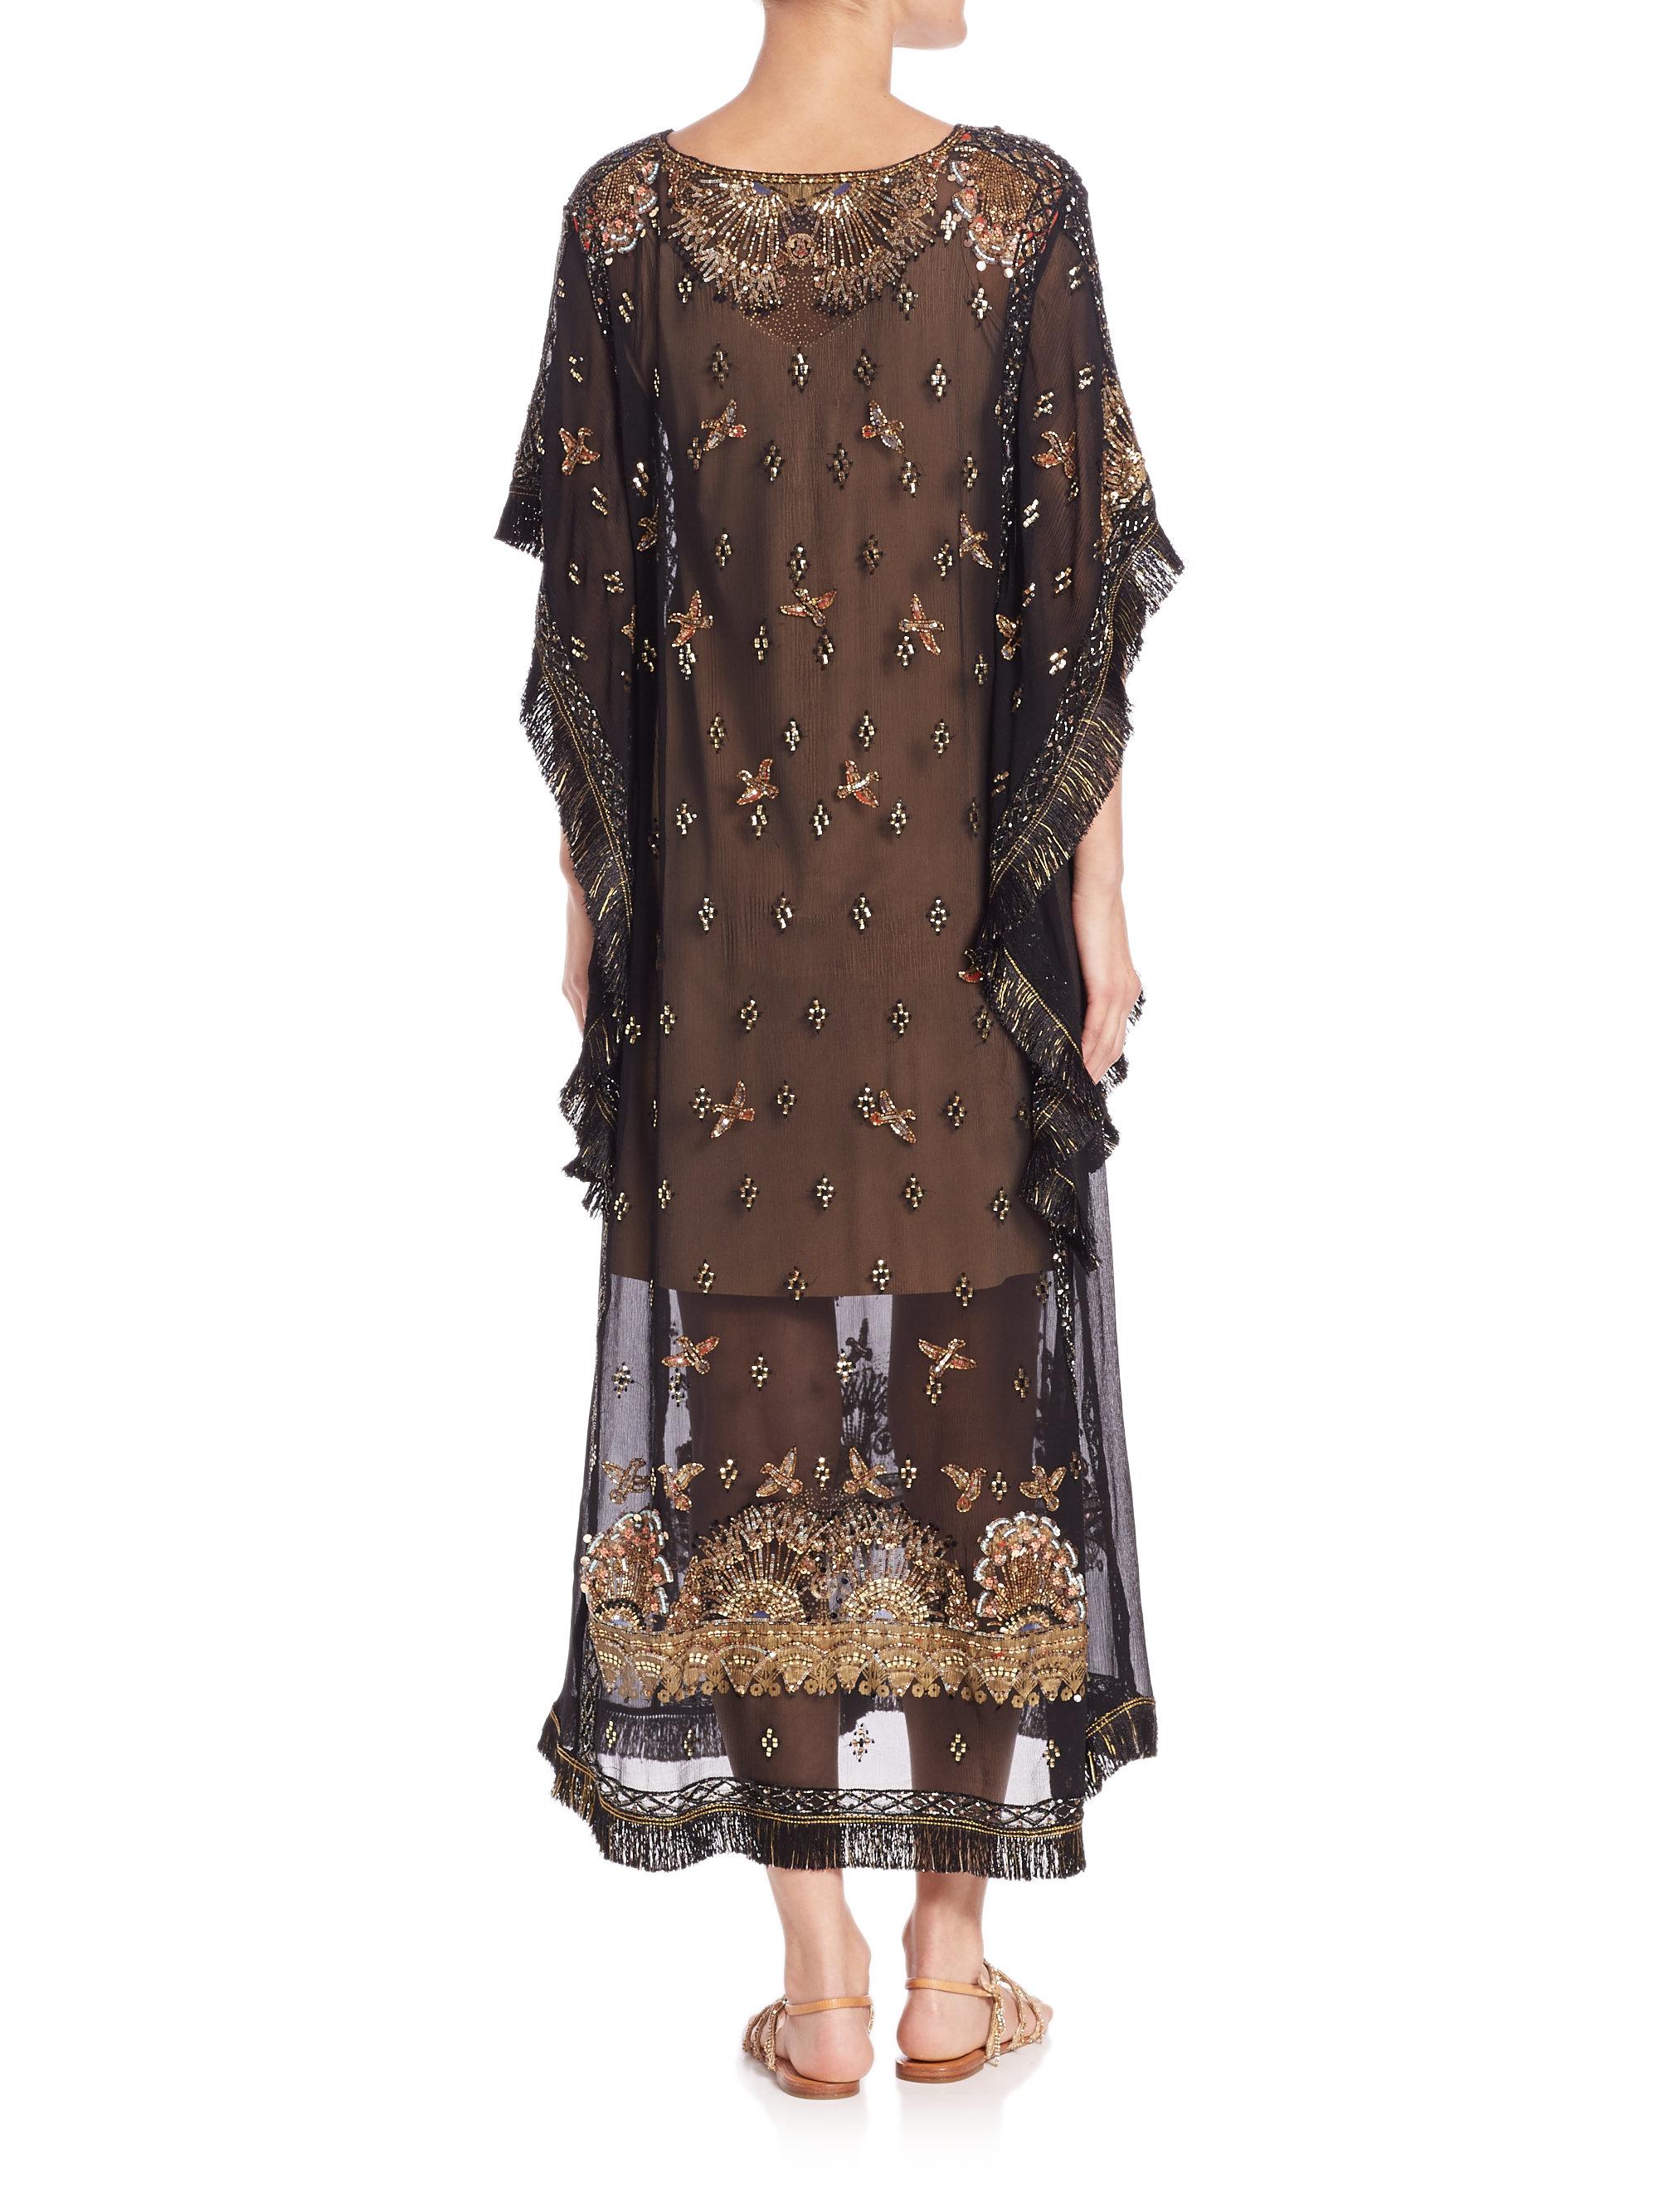 Lyst Calypso St Barth Lorsea Dress In Black